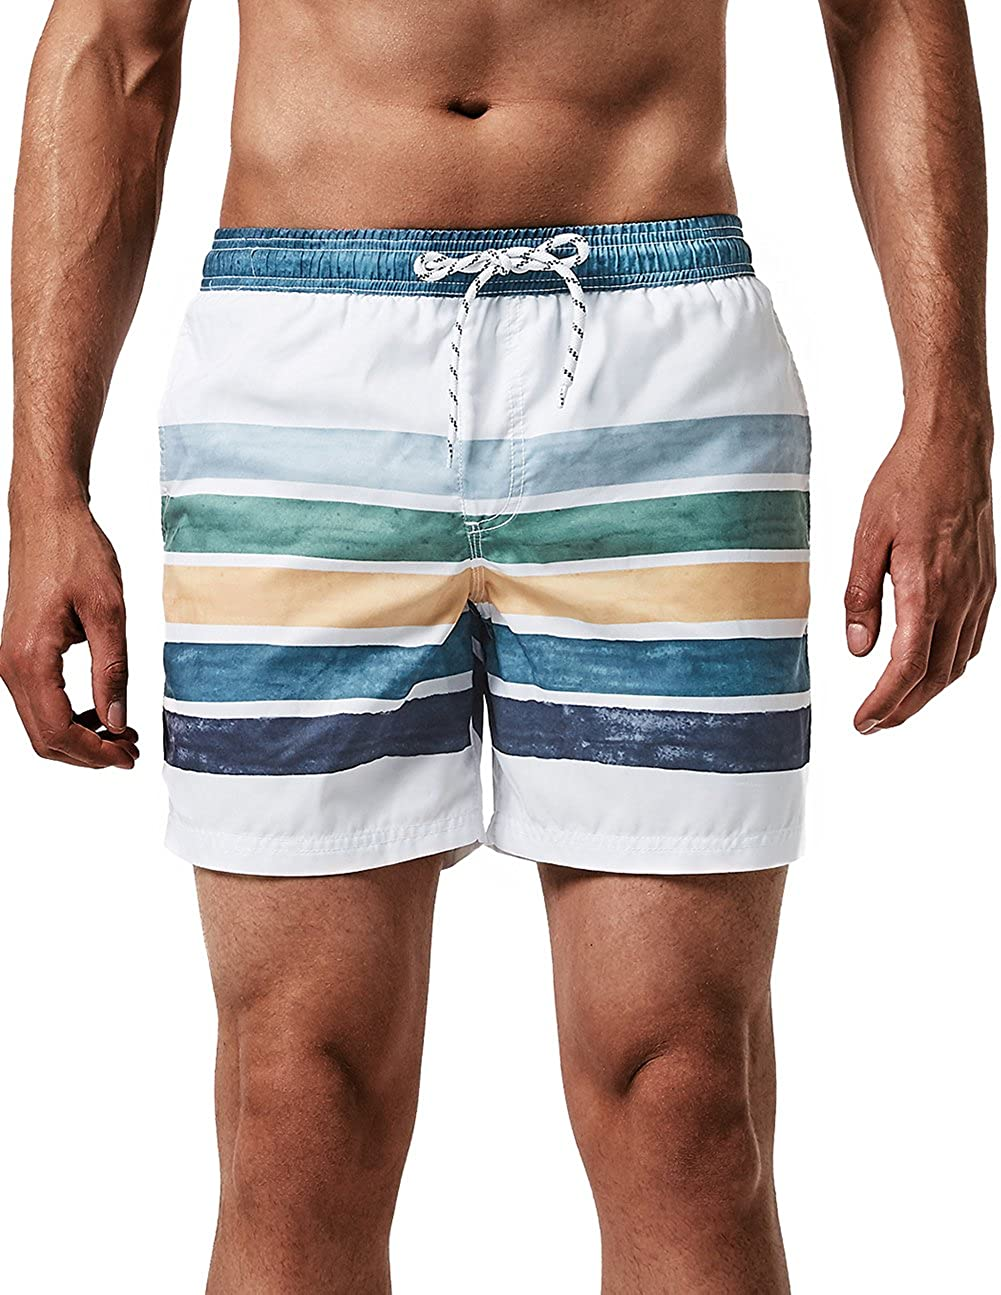 MaaMgic Mens Quick Dry Swim Trunks with Mesh Lining Flamingo Boardshorts